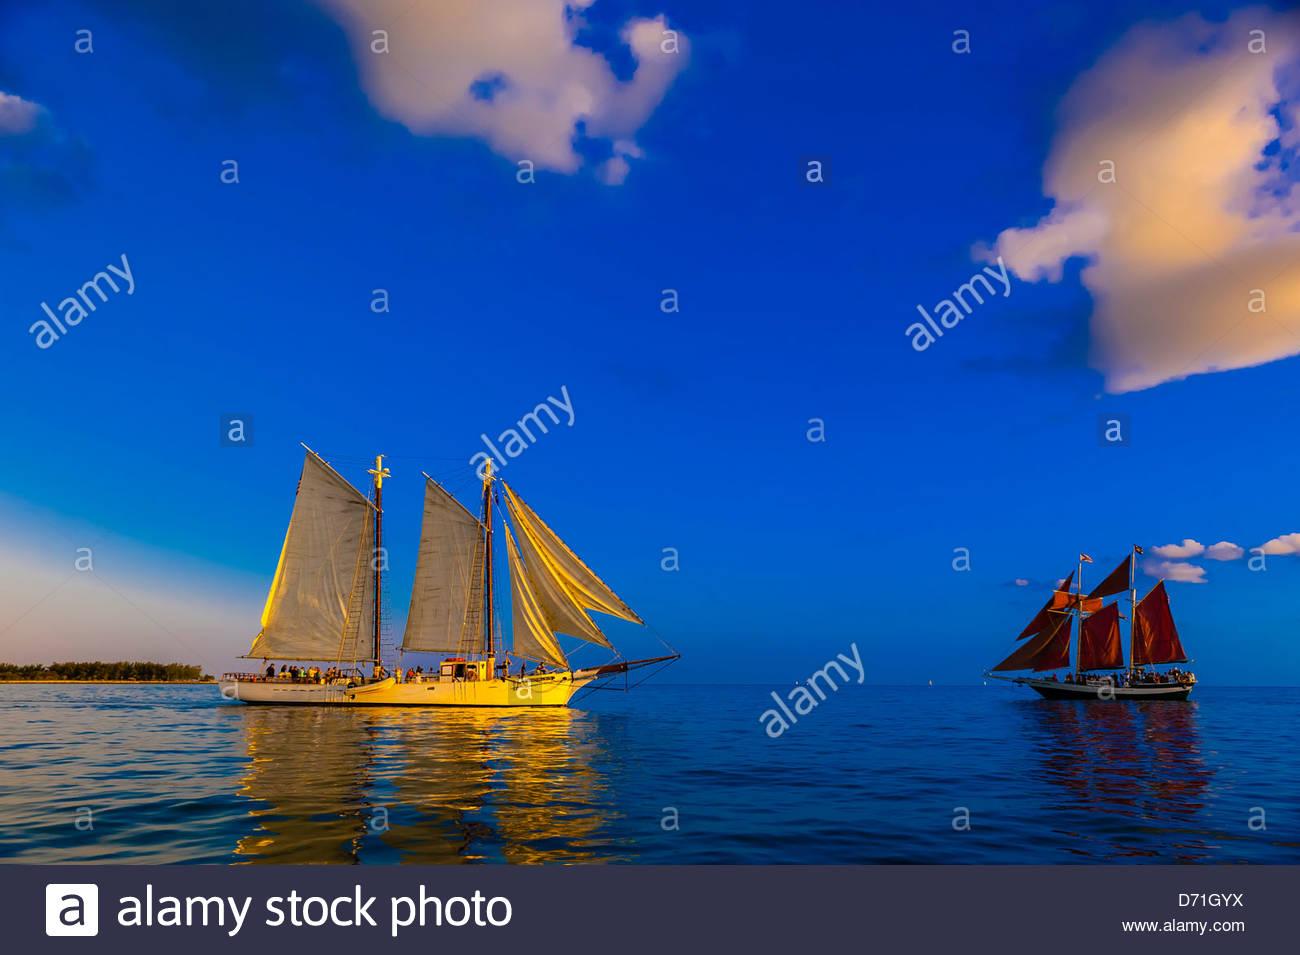 Schooner Western Union and the Jolly Rover II sailing off Key West, Florida Keys, Florida USA Stock Photo